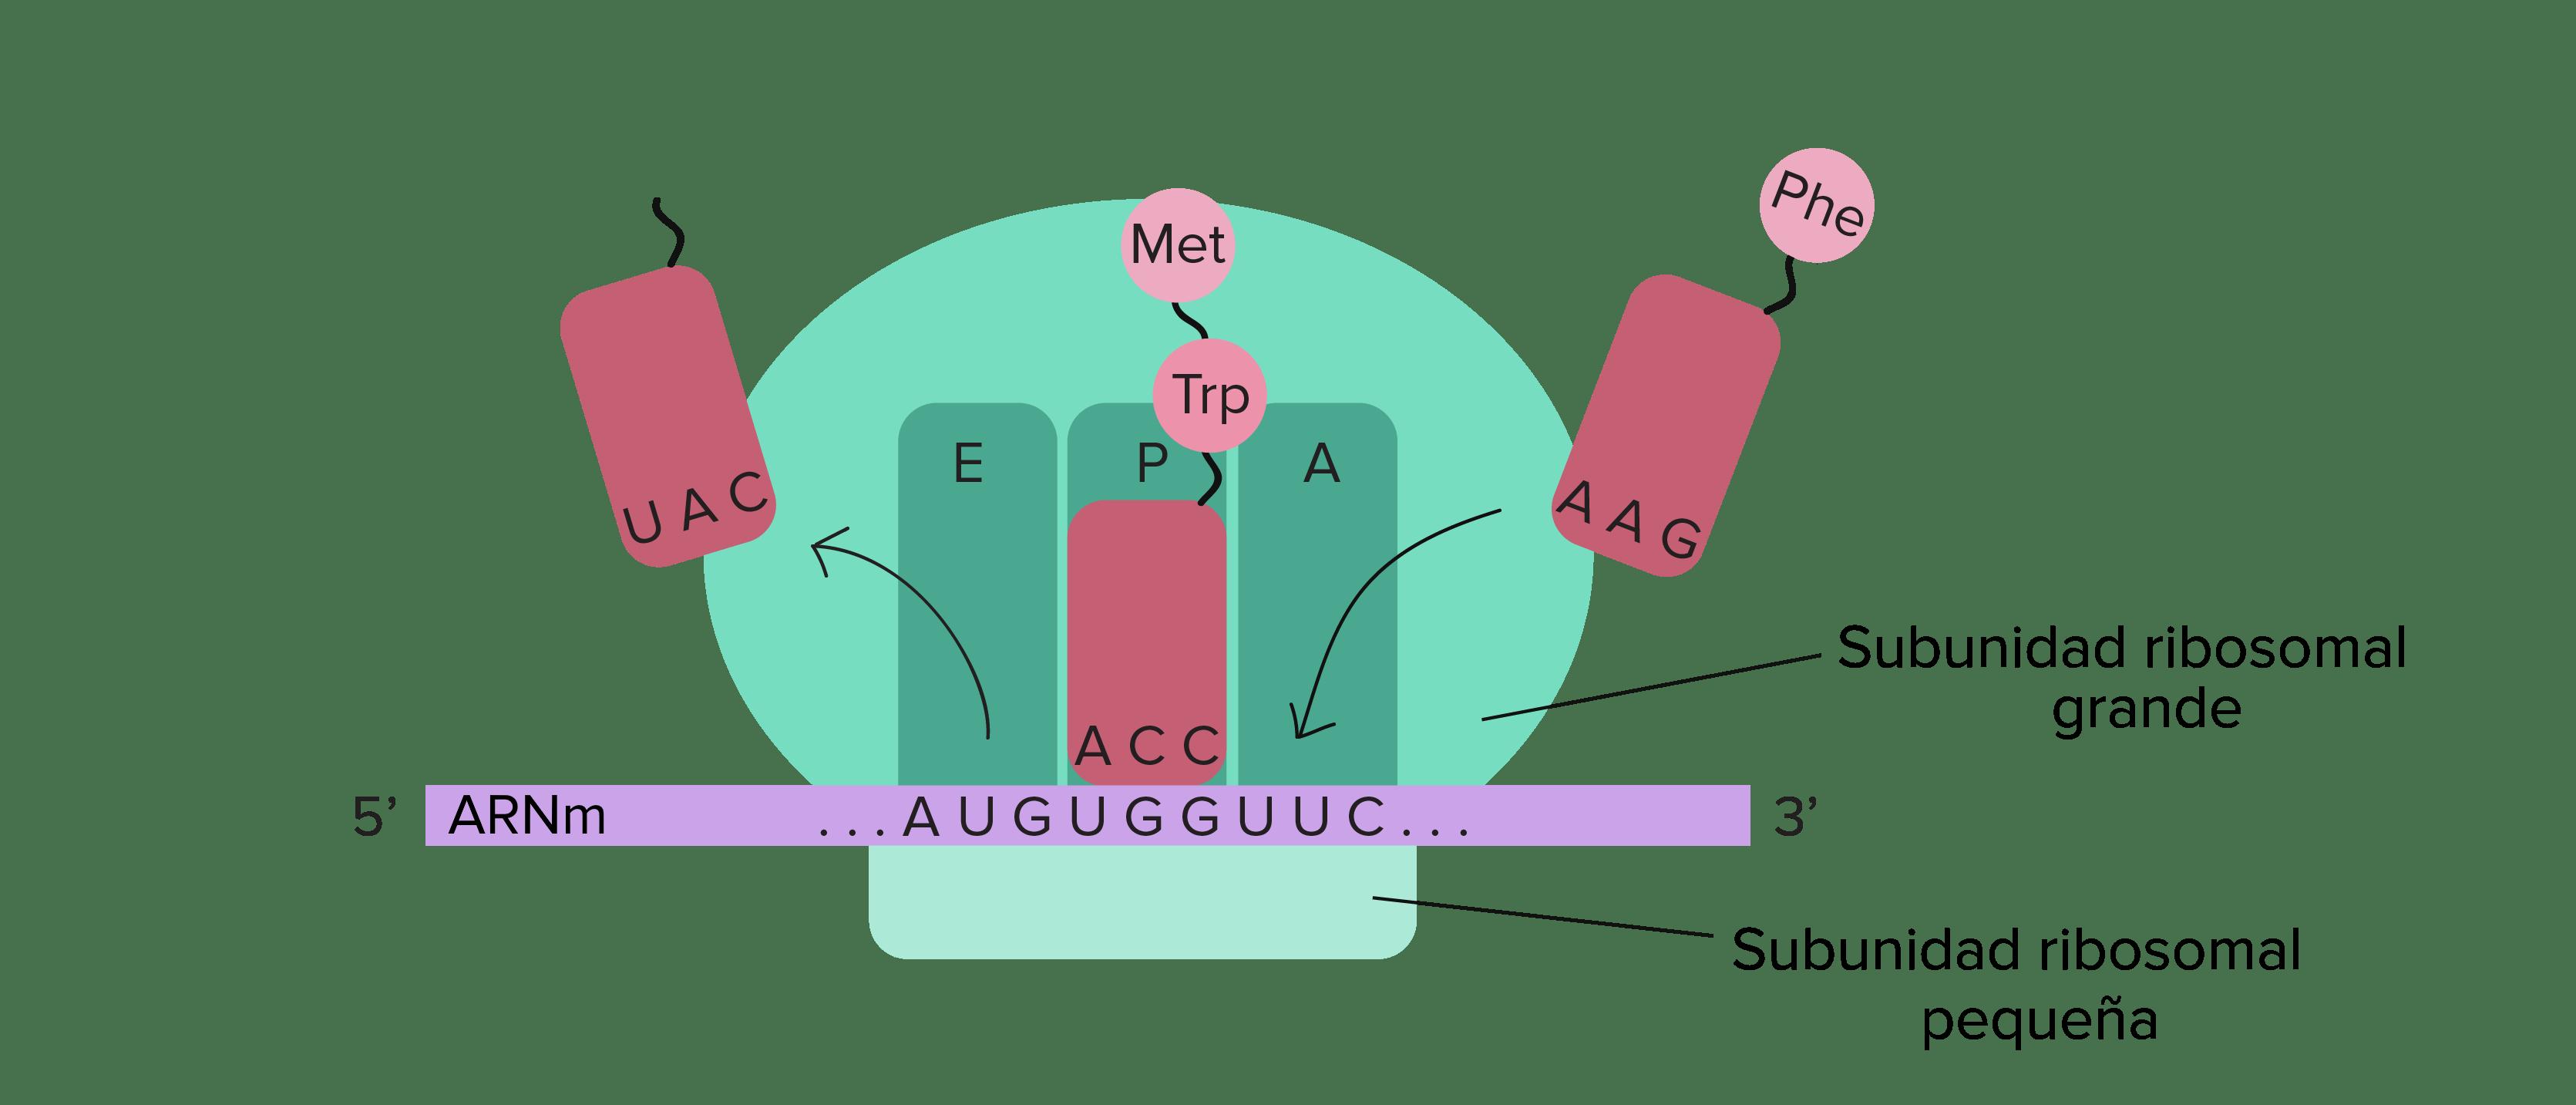 Arn Ribosomico Definicion